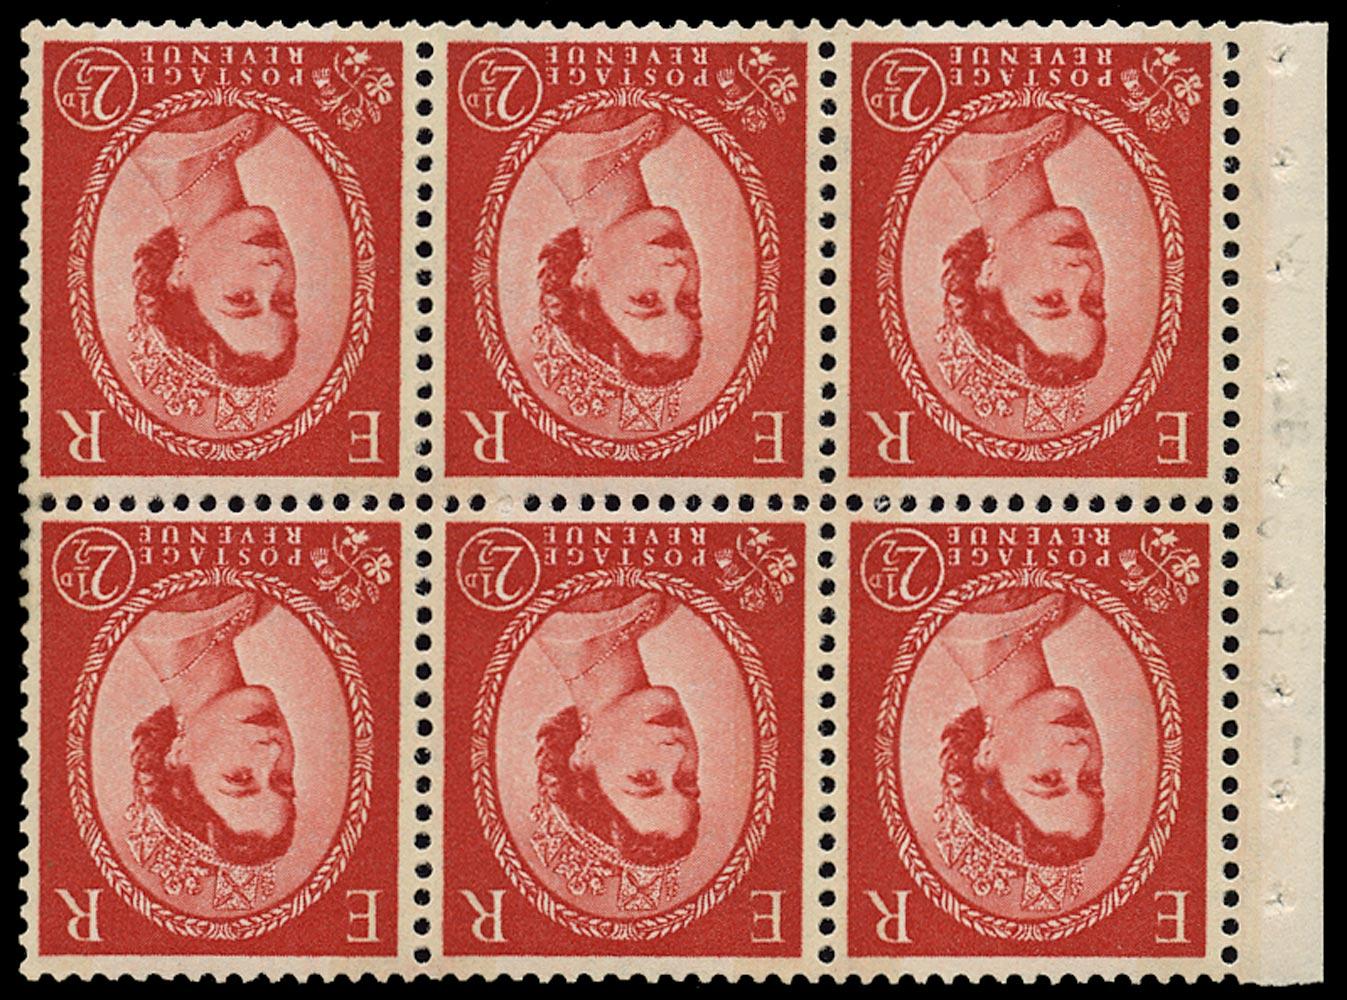 GB 1961  SG614lWi Booklet pane - Wmk. Crowns inverted, Two bands, blue Phosphor